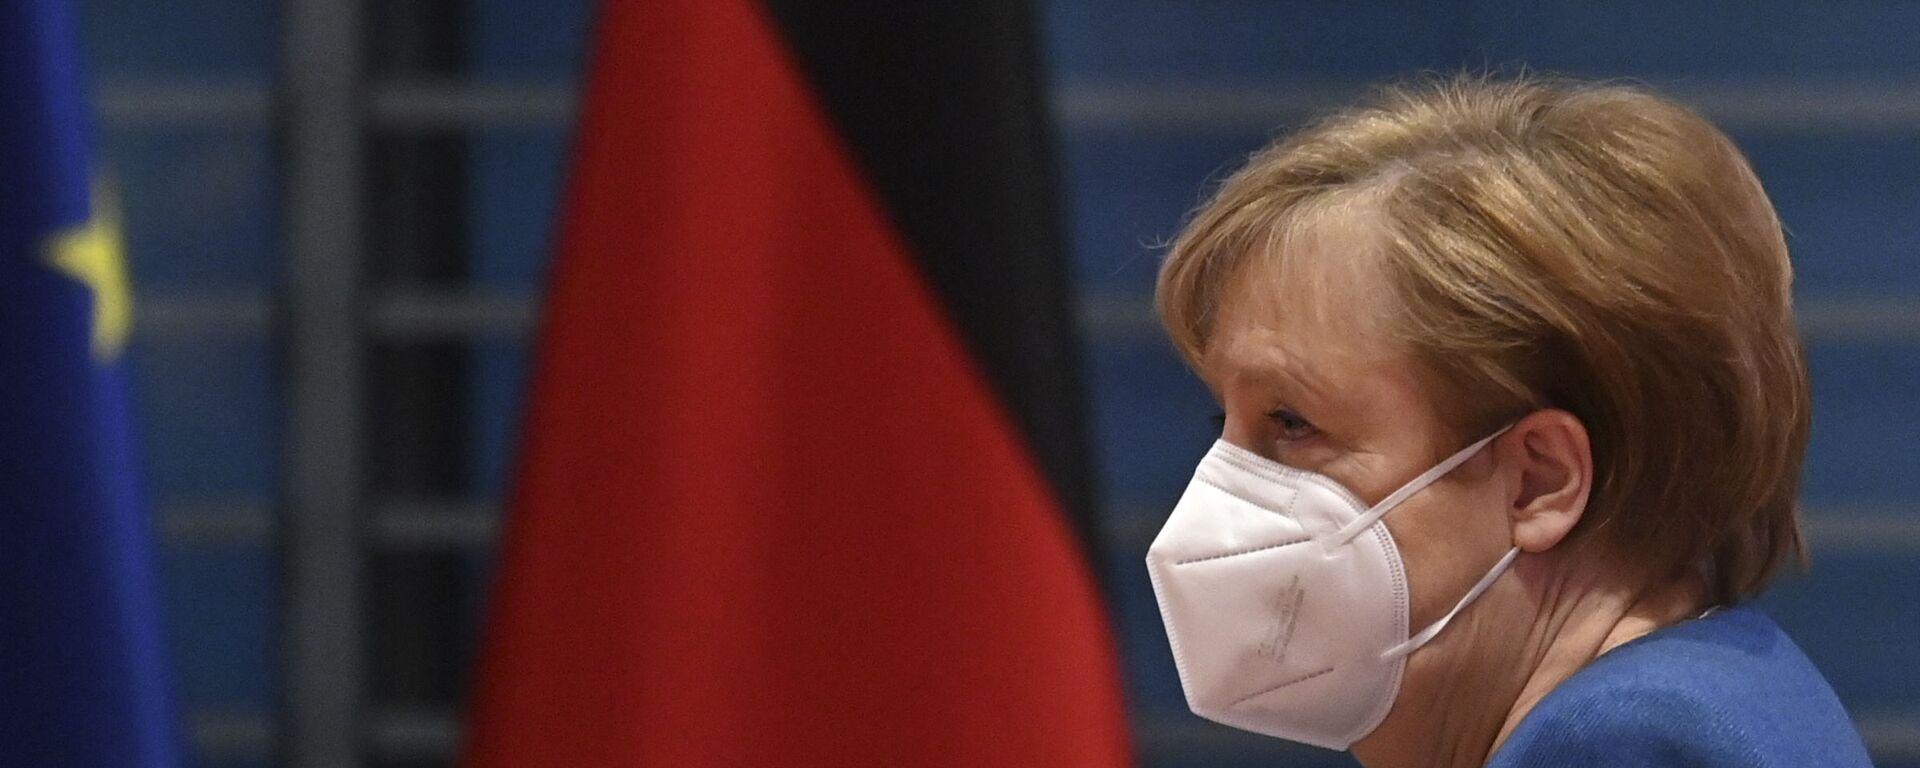 Kanclerz Niemiec Angela Merkel. - Sputnik Polska, 1920, 12.06.2021